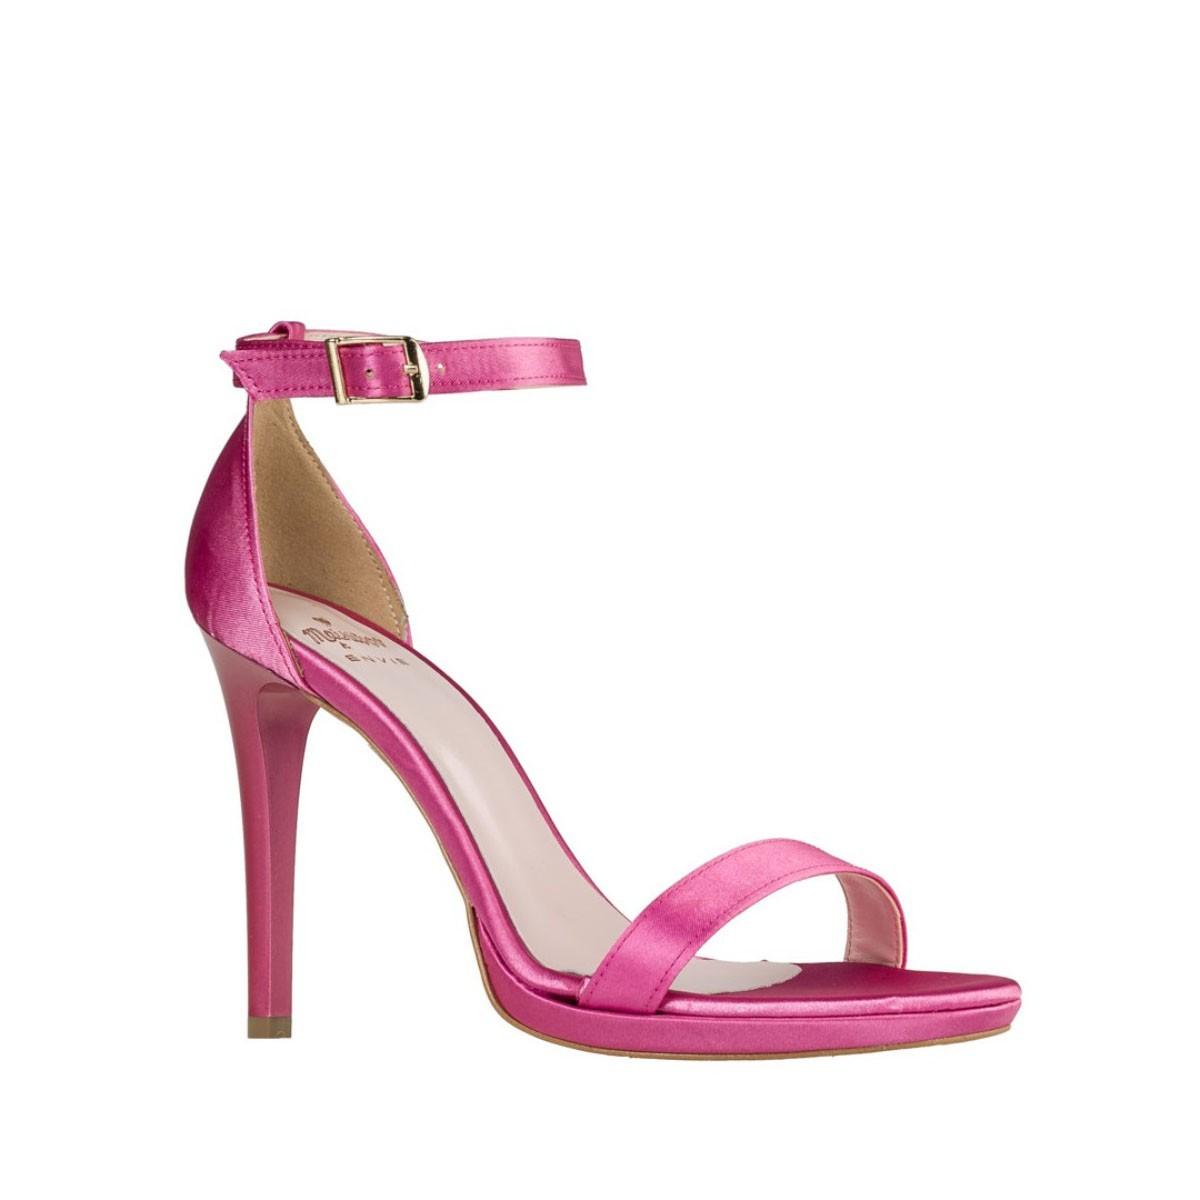 BagiotaShoes Mairiboo by Envie Shoes Γυναικεία Πέδιλα M03-05920 Φούξια Mairiboo  M03-05920 Φούξια 7f8ab327b1f